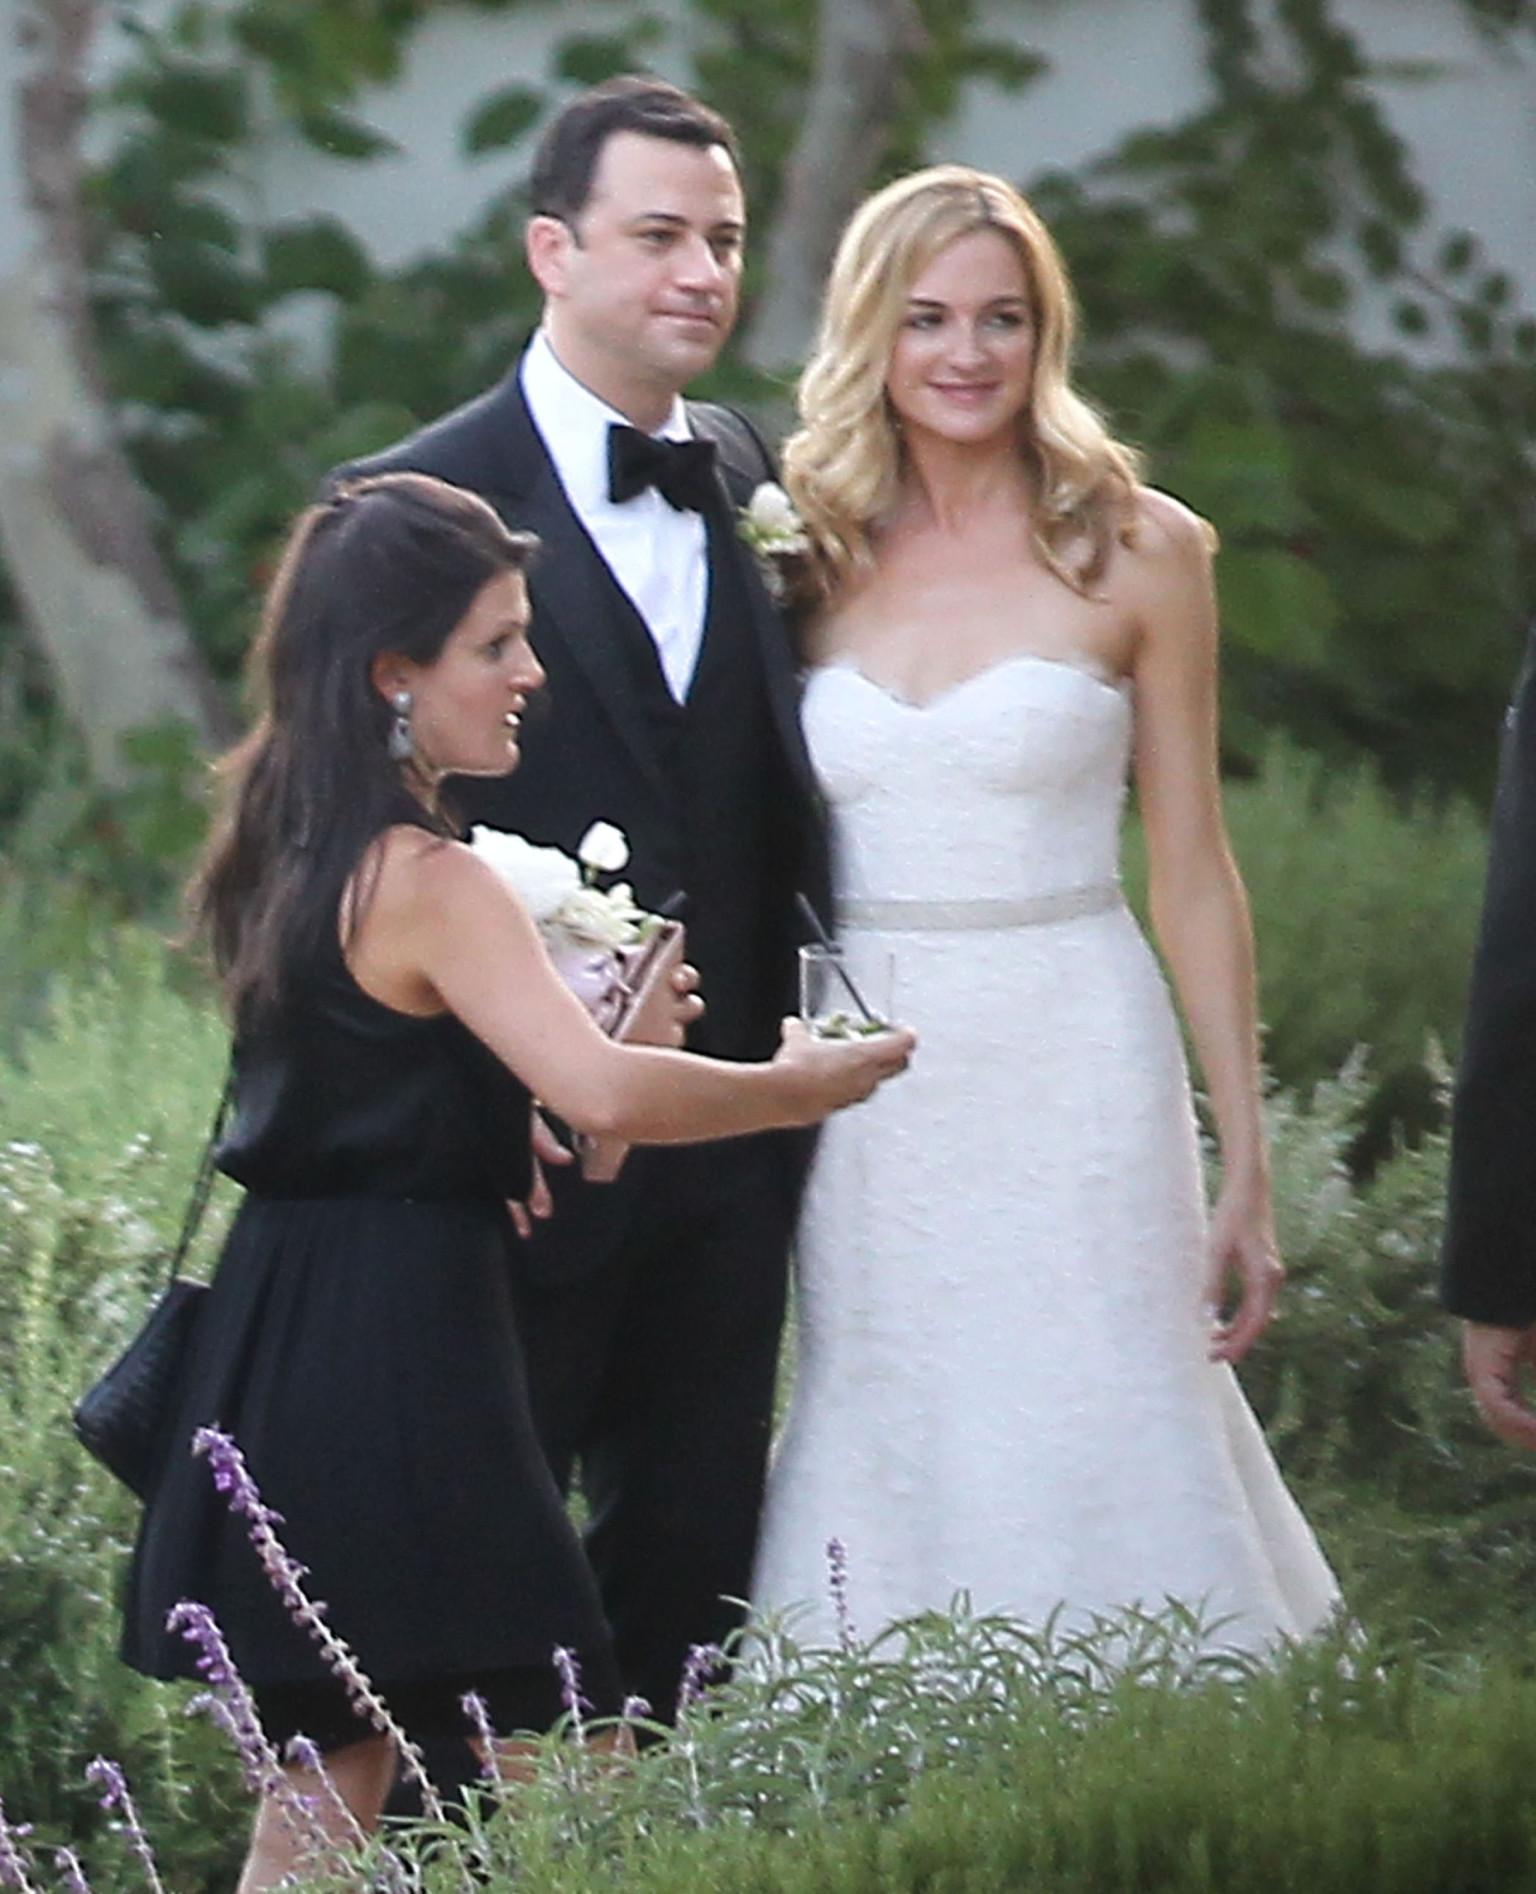 jimmy kimmel married late night host weds molly mcnearney